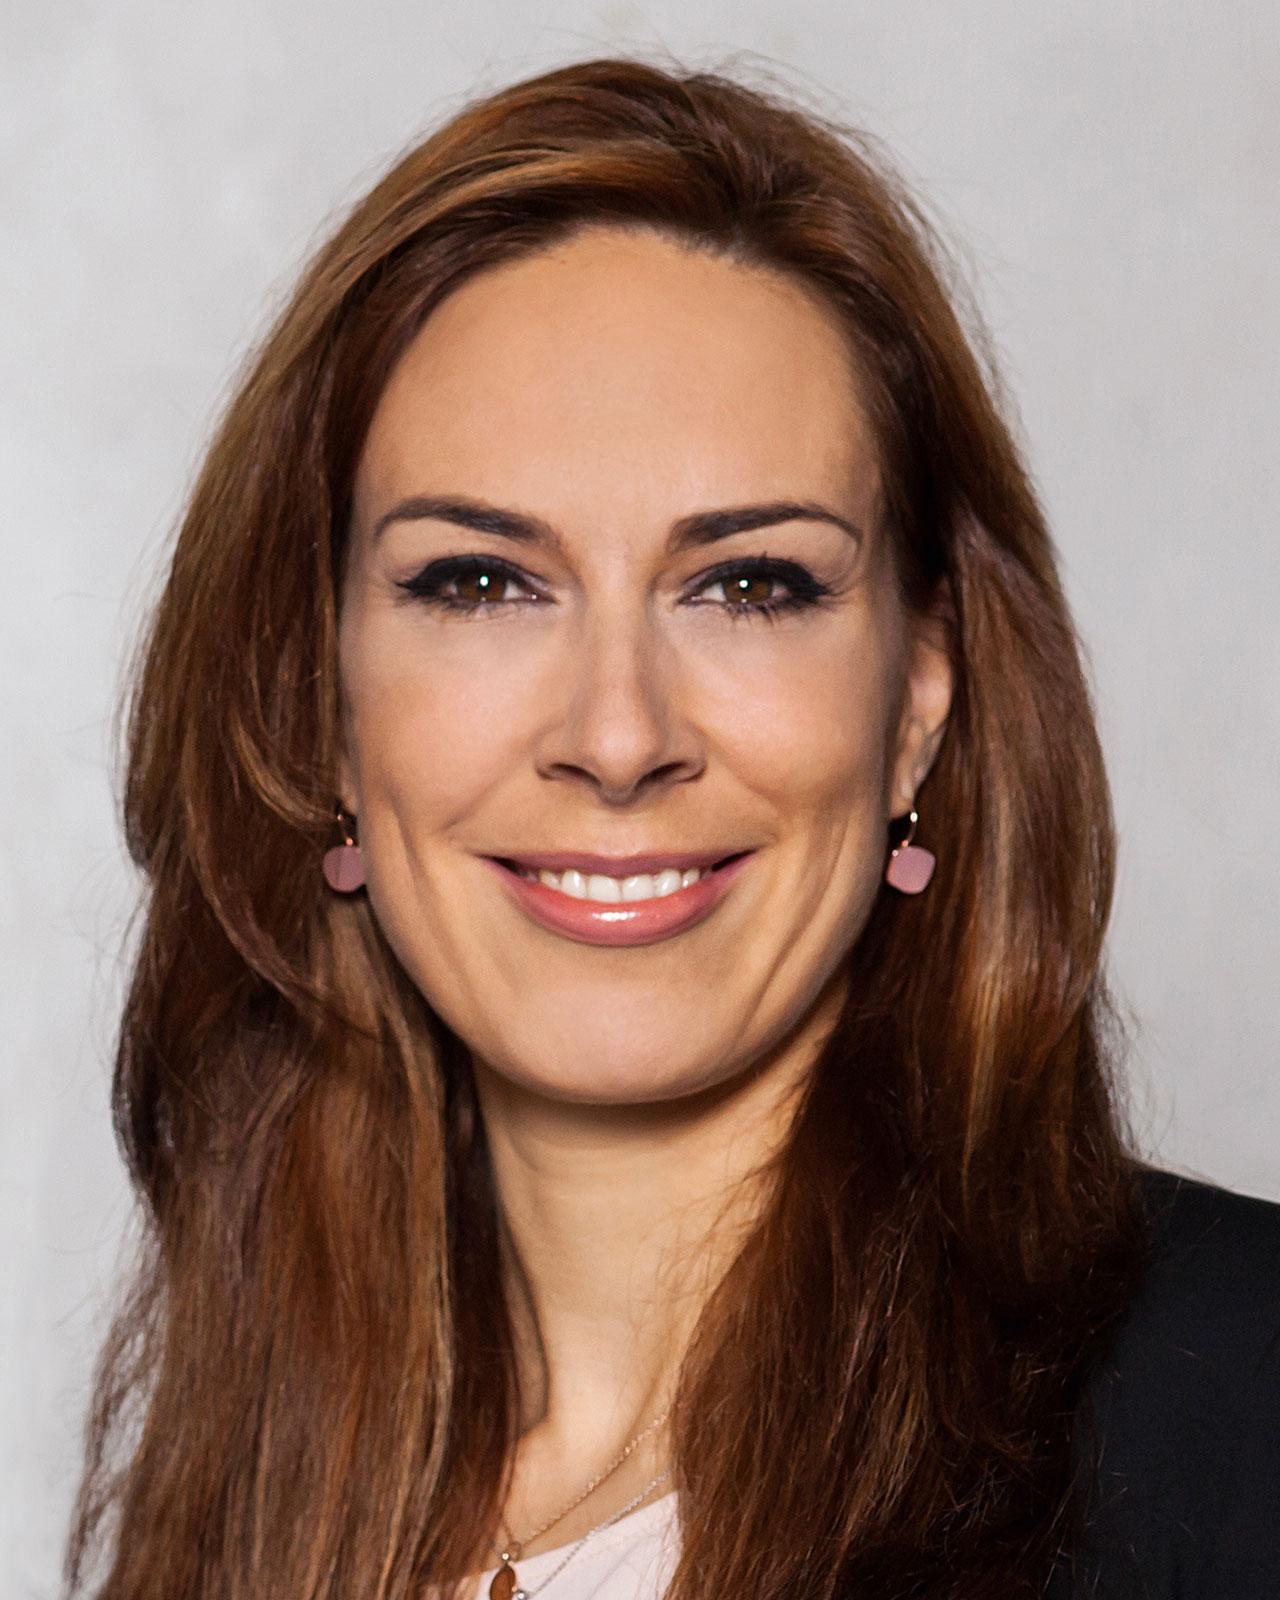 Anina Veigel